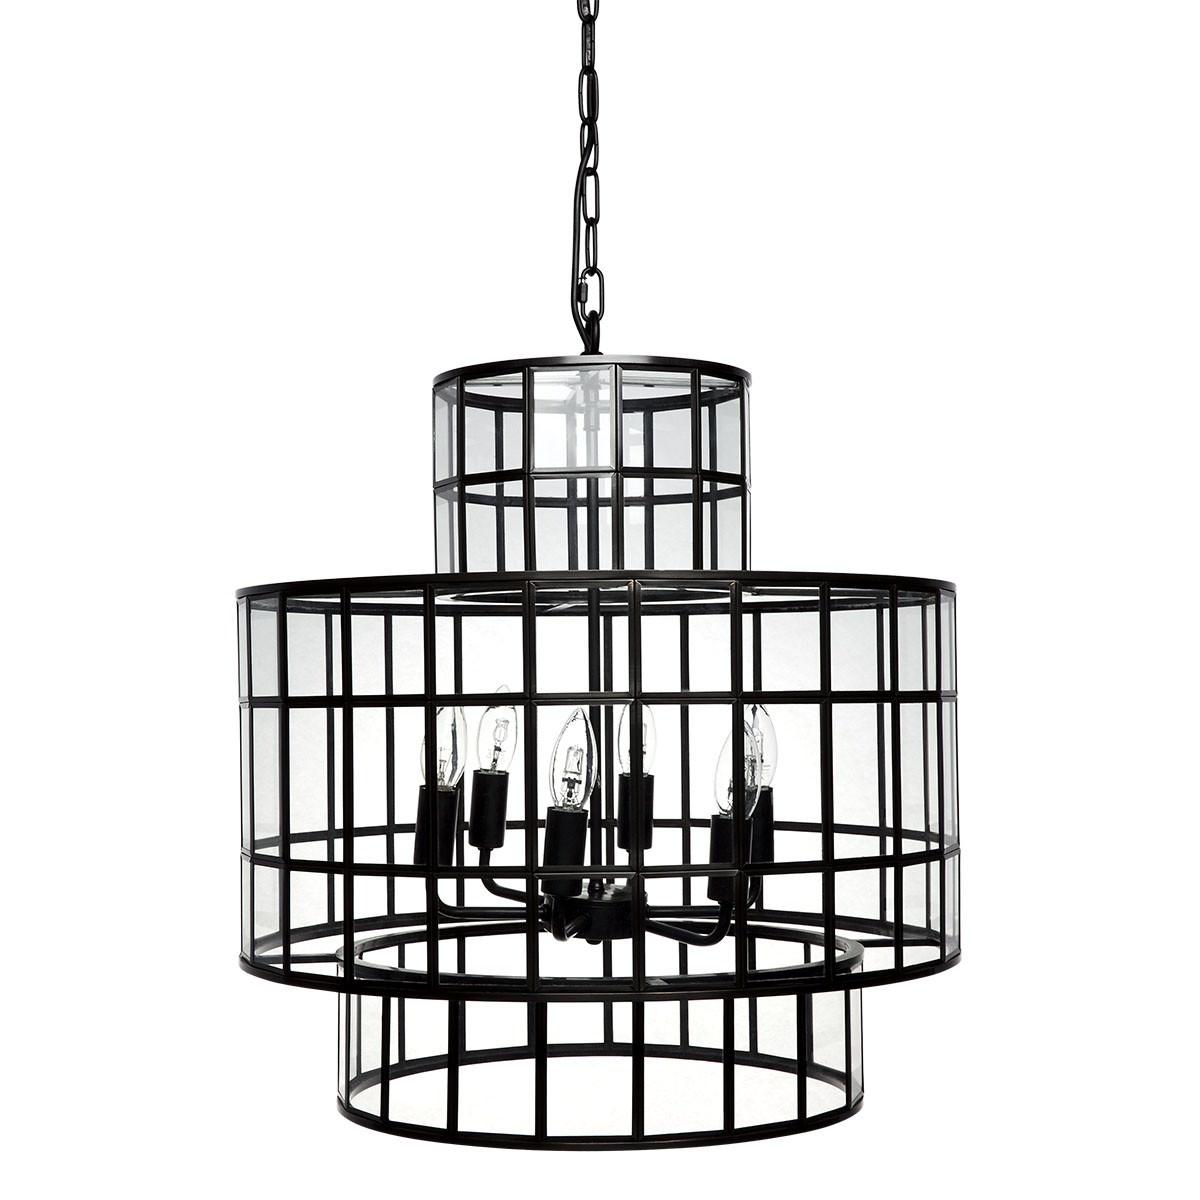 Clayton Steel & Glass Pendant Light